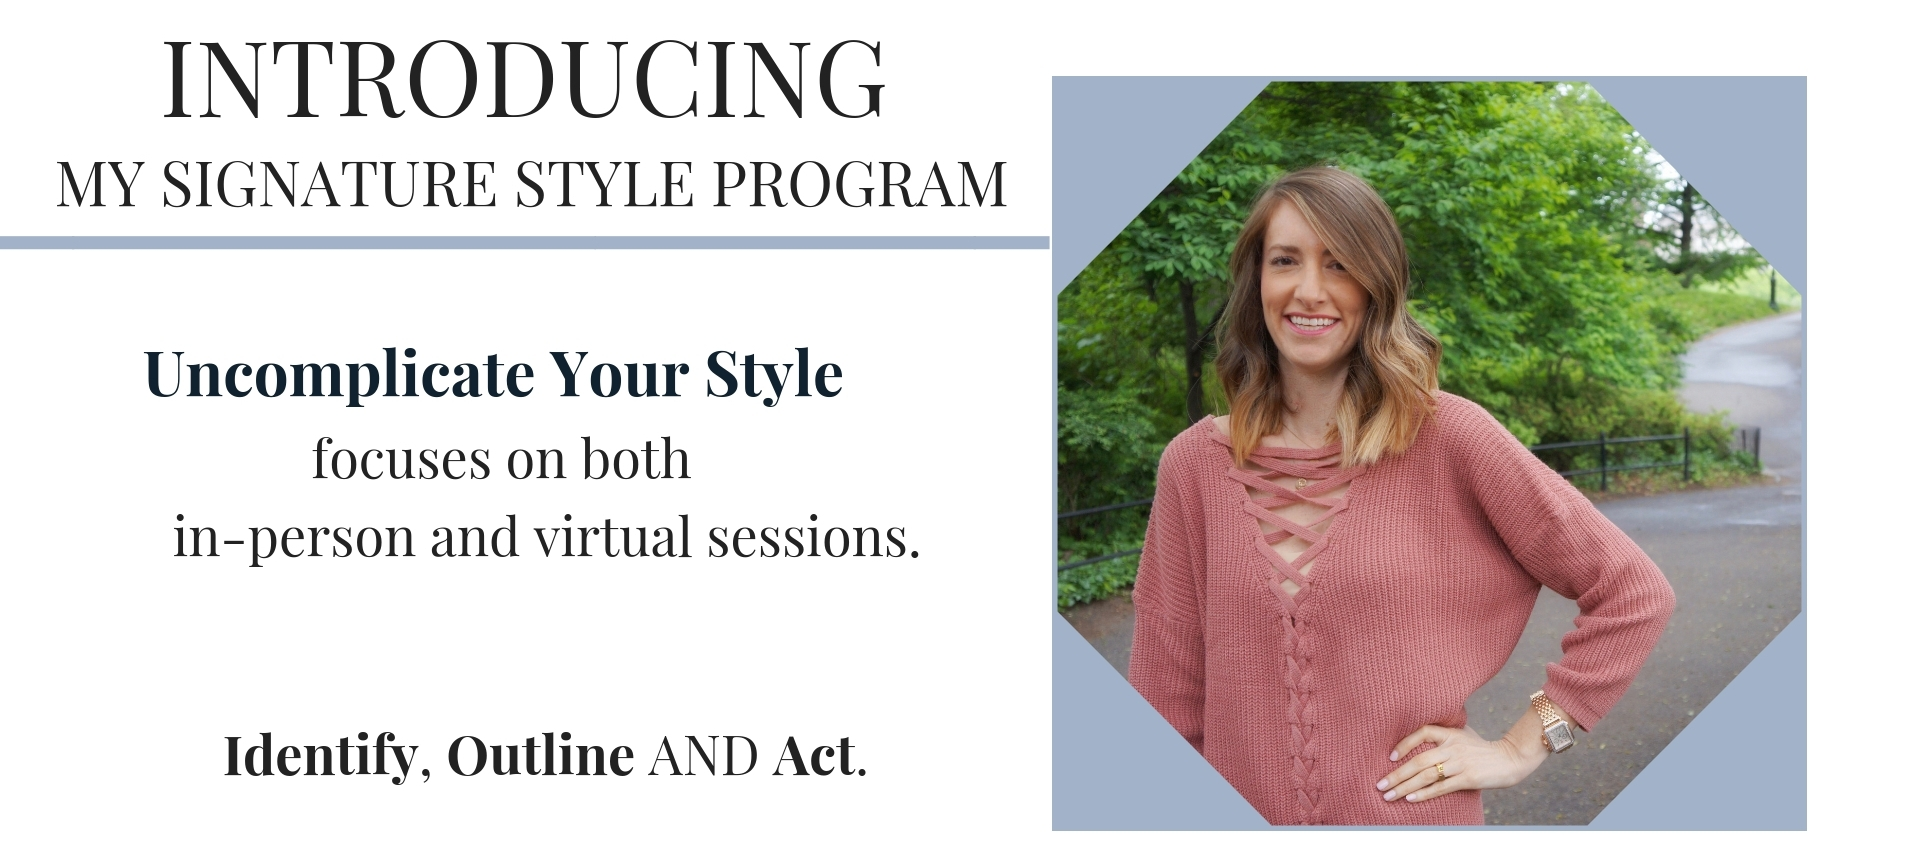 signature_style_program_Allie_Brandwein_image_wardrobe_consultant_virtual_stylist_nyc (1).jpg